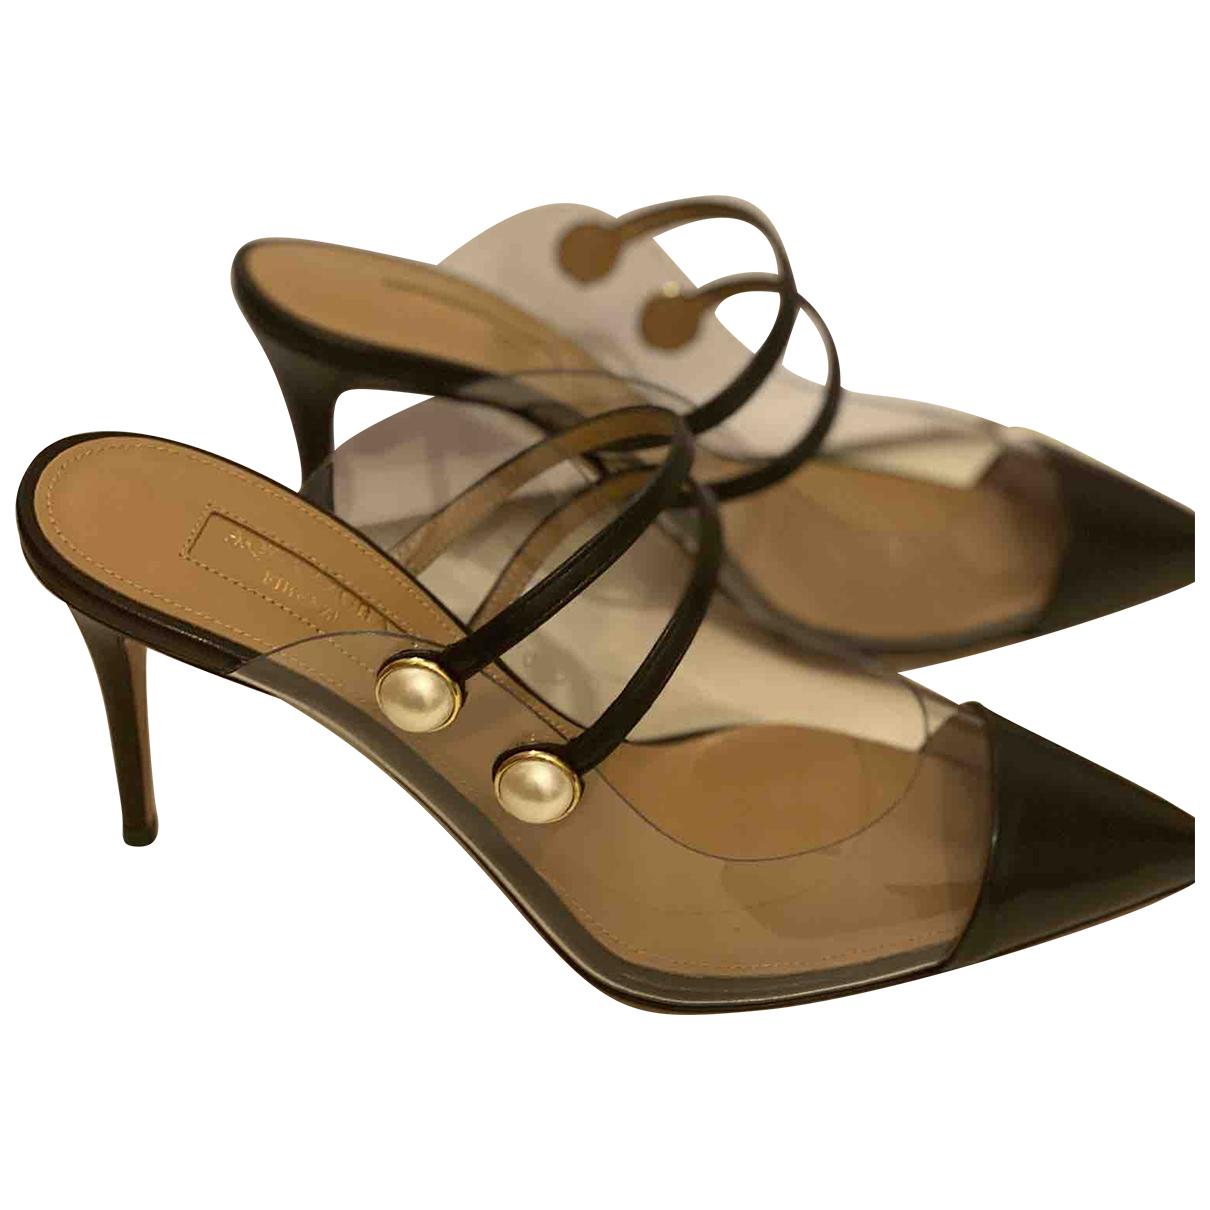 Aquazzura \N Black Leather Mules & Clogs for Women 36 EU